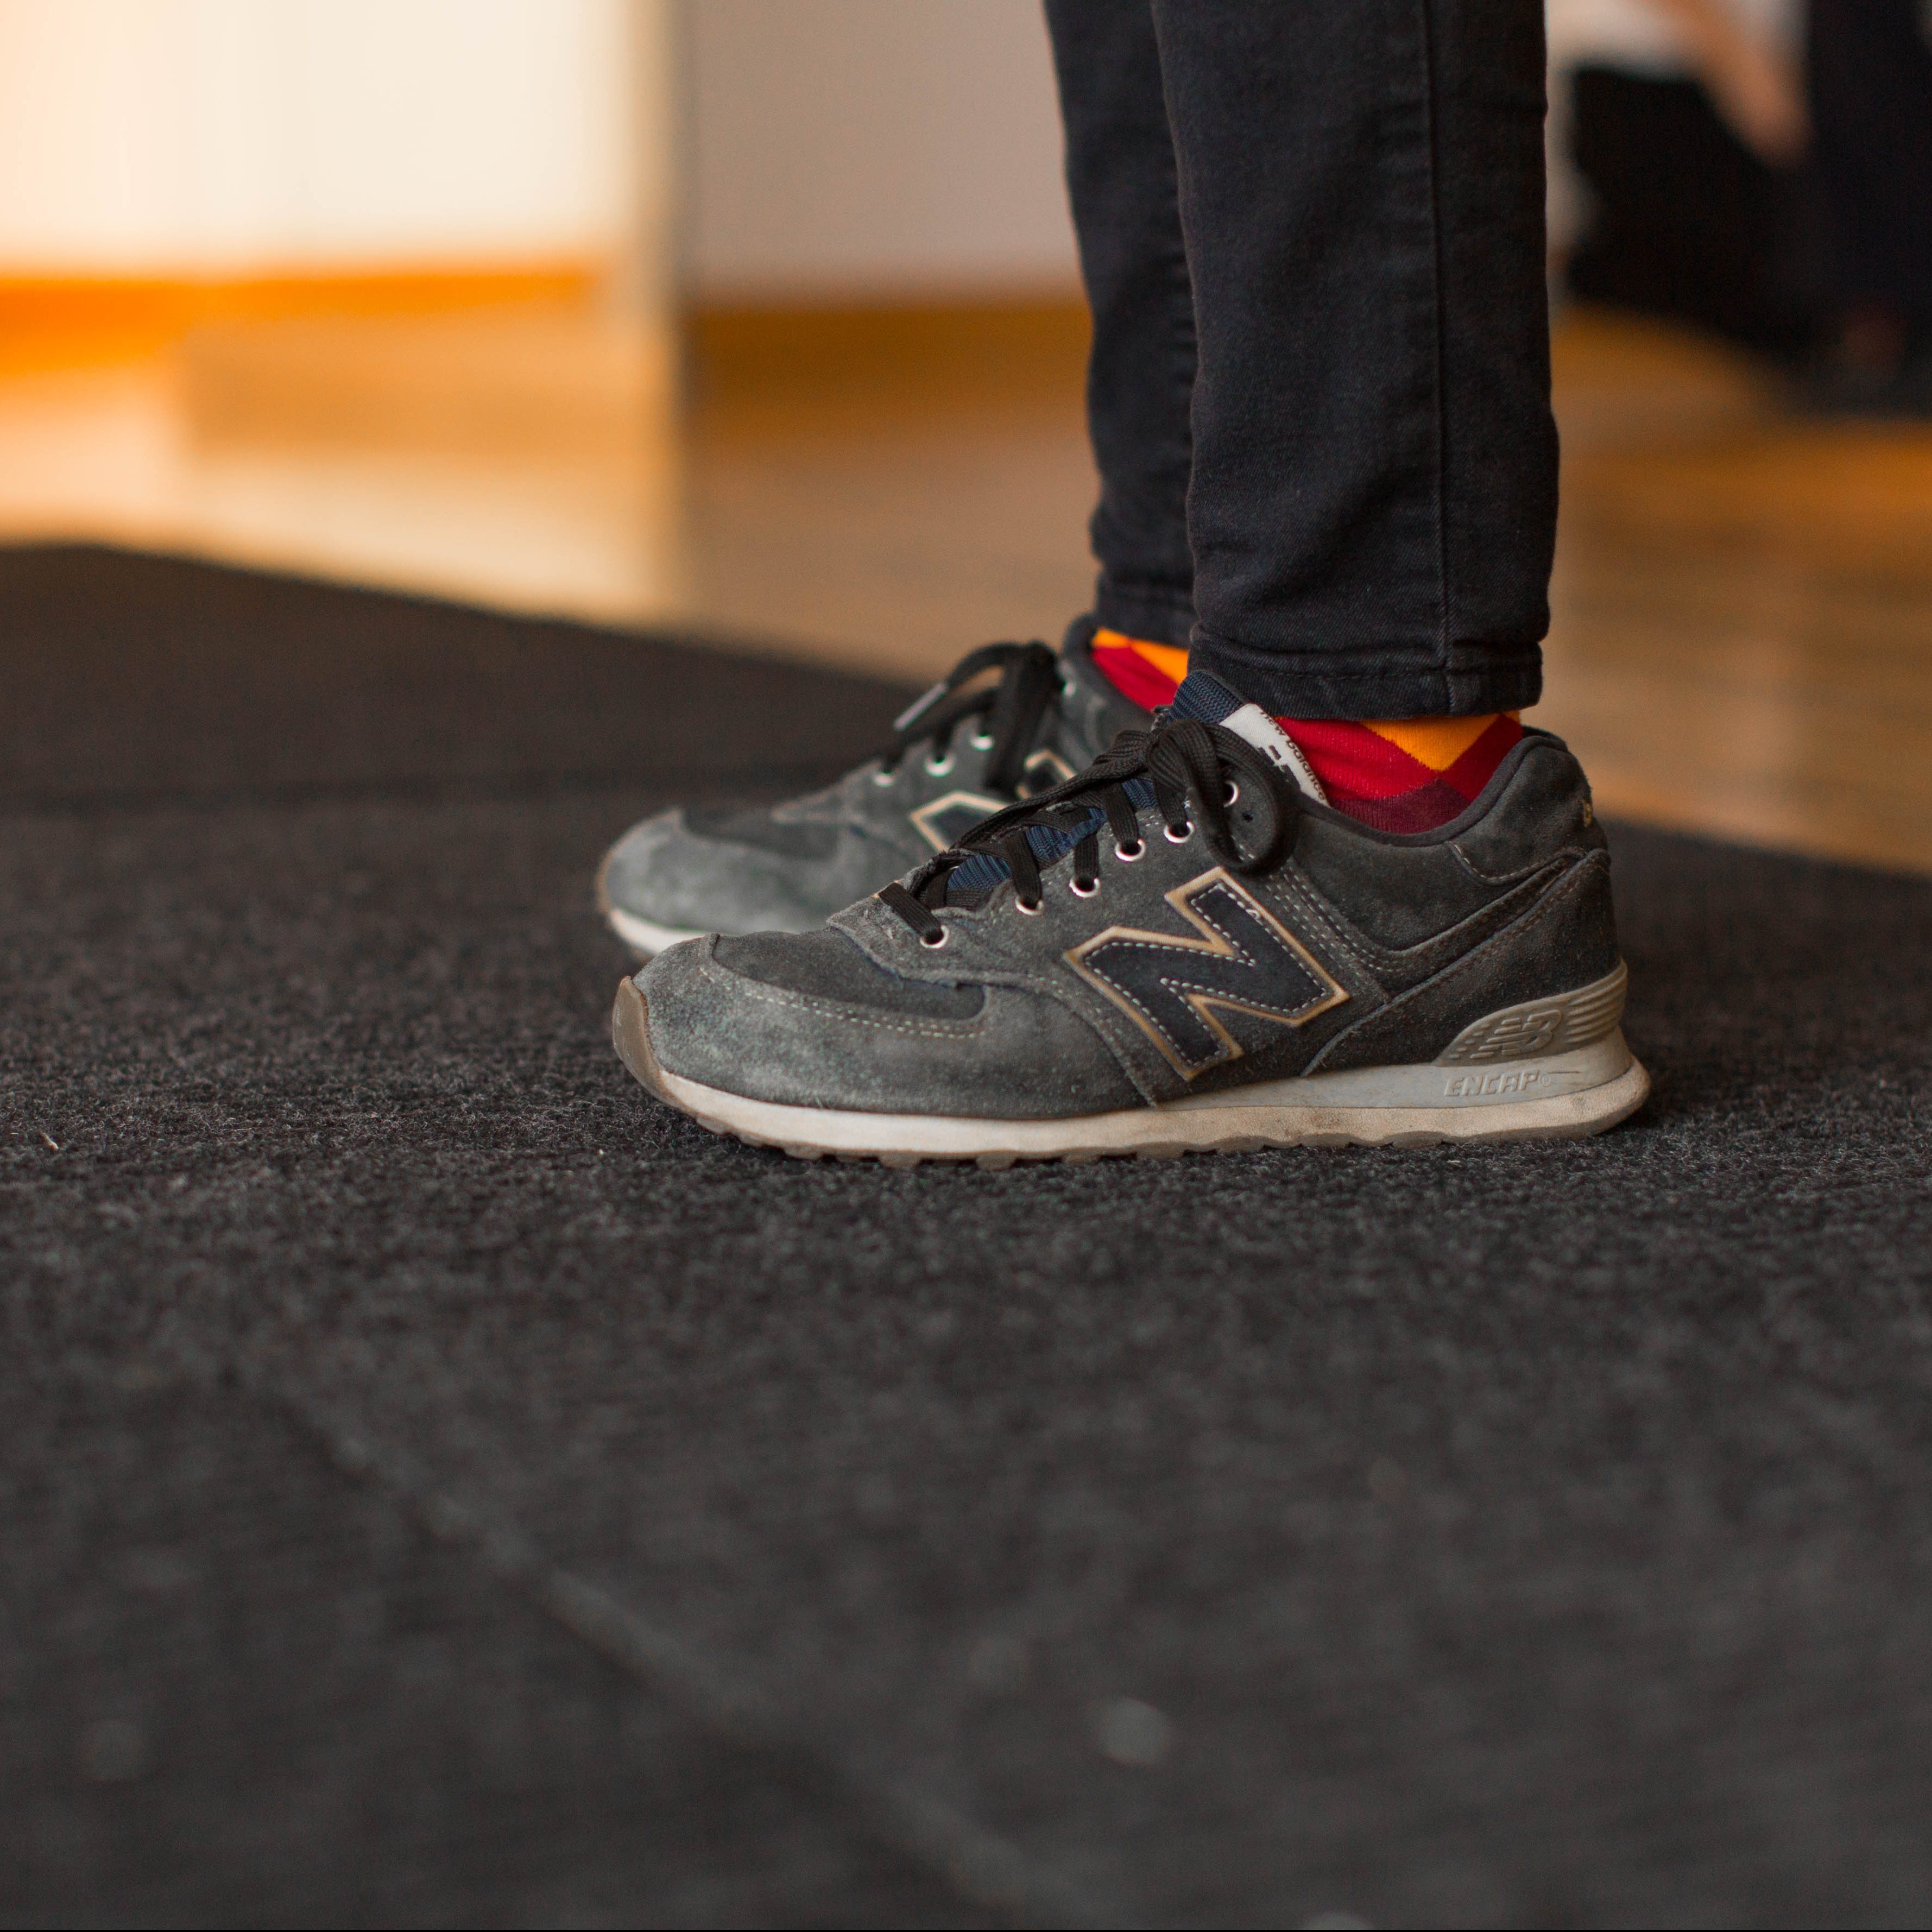 Gallery visitor feet on floor